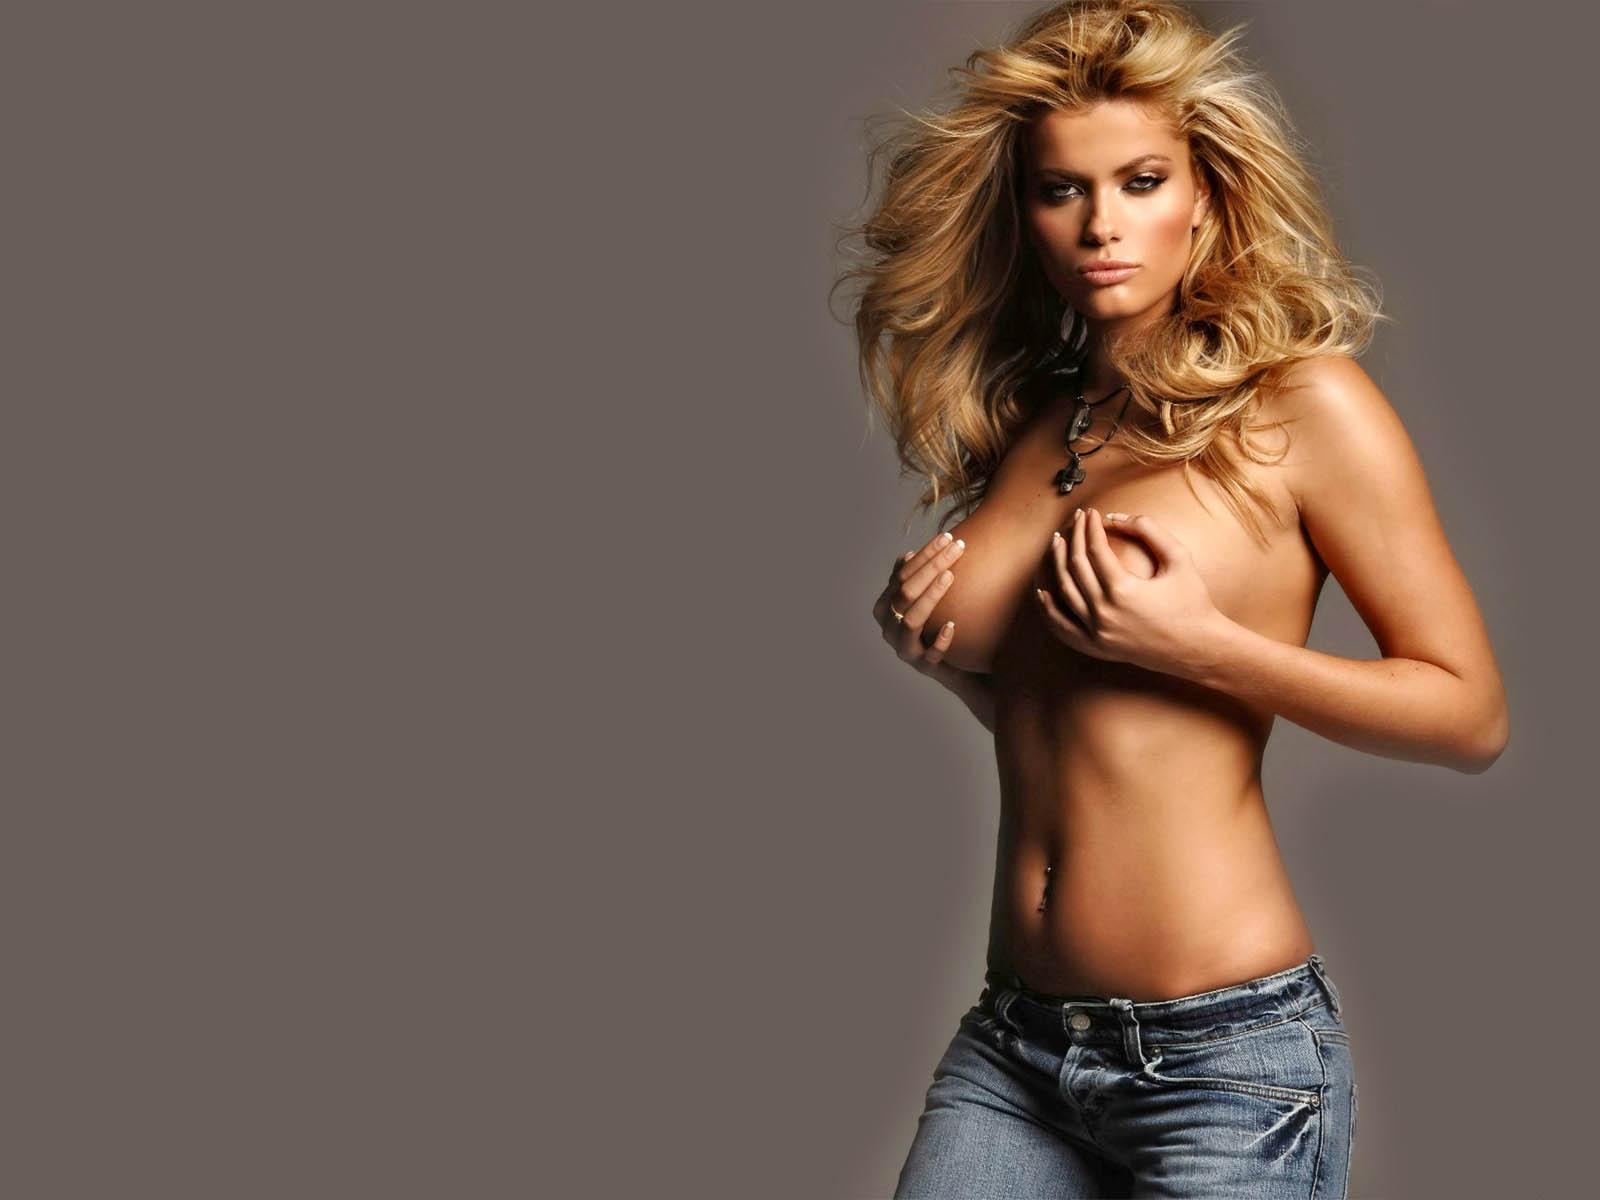 http://pictar.ru/data/media/67/celebrities__890_.jpg